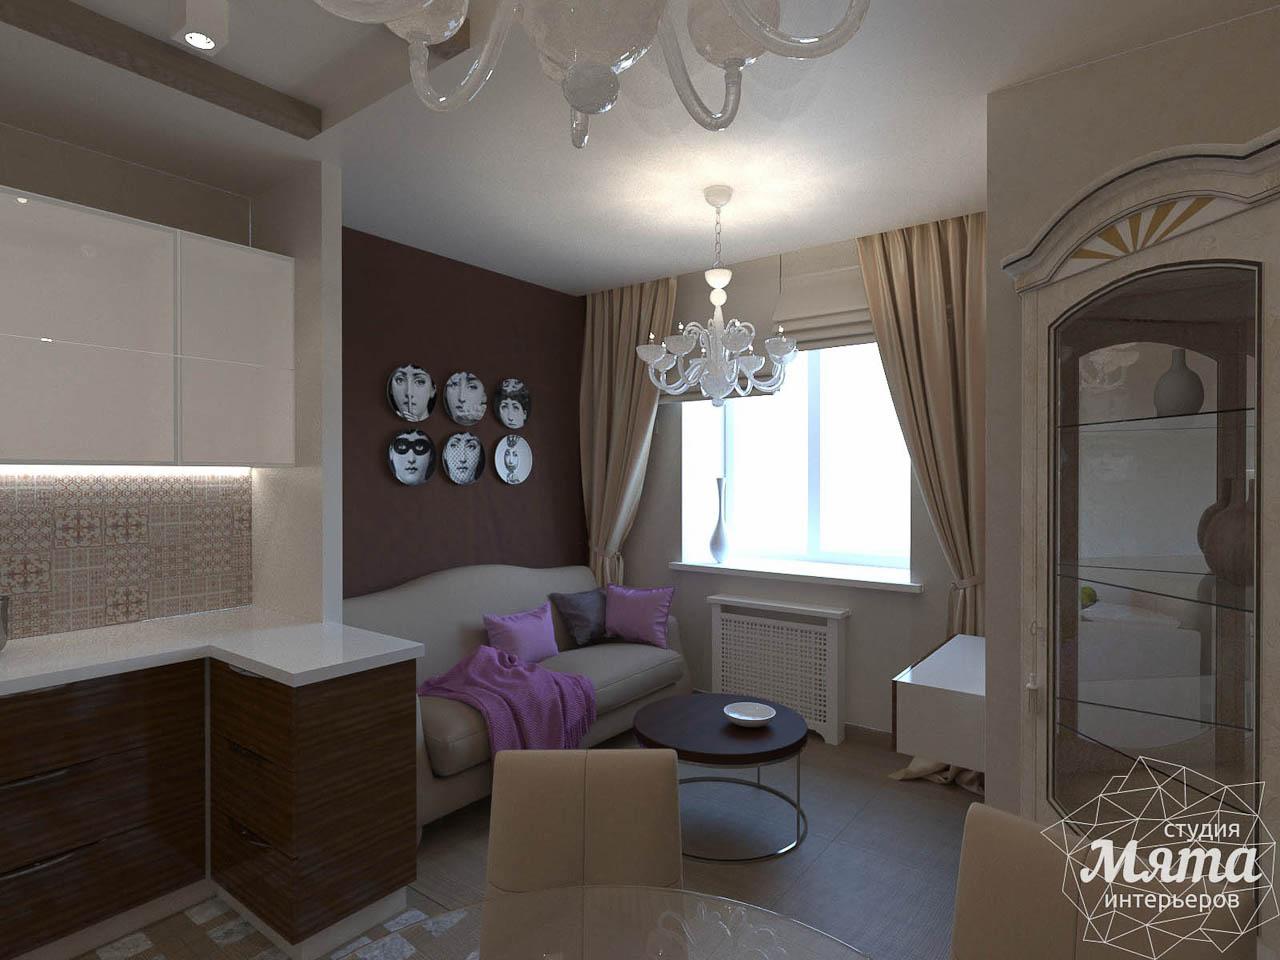 Дизайн интерьера трехкомнатной квартиры по ул. Мельникова 27 img1858260772